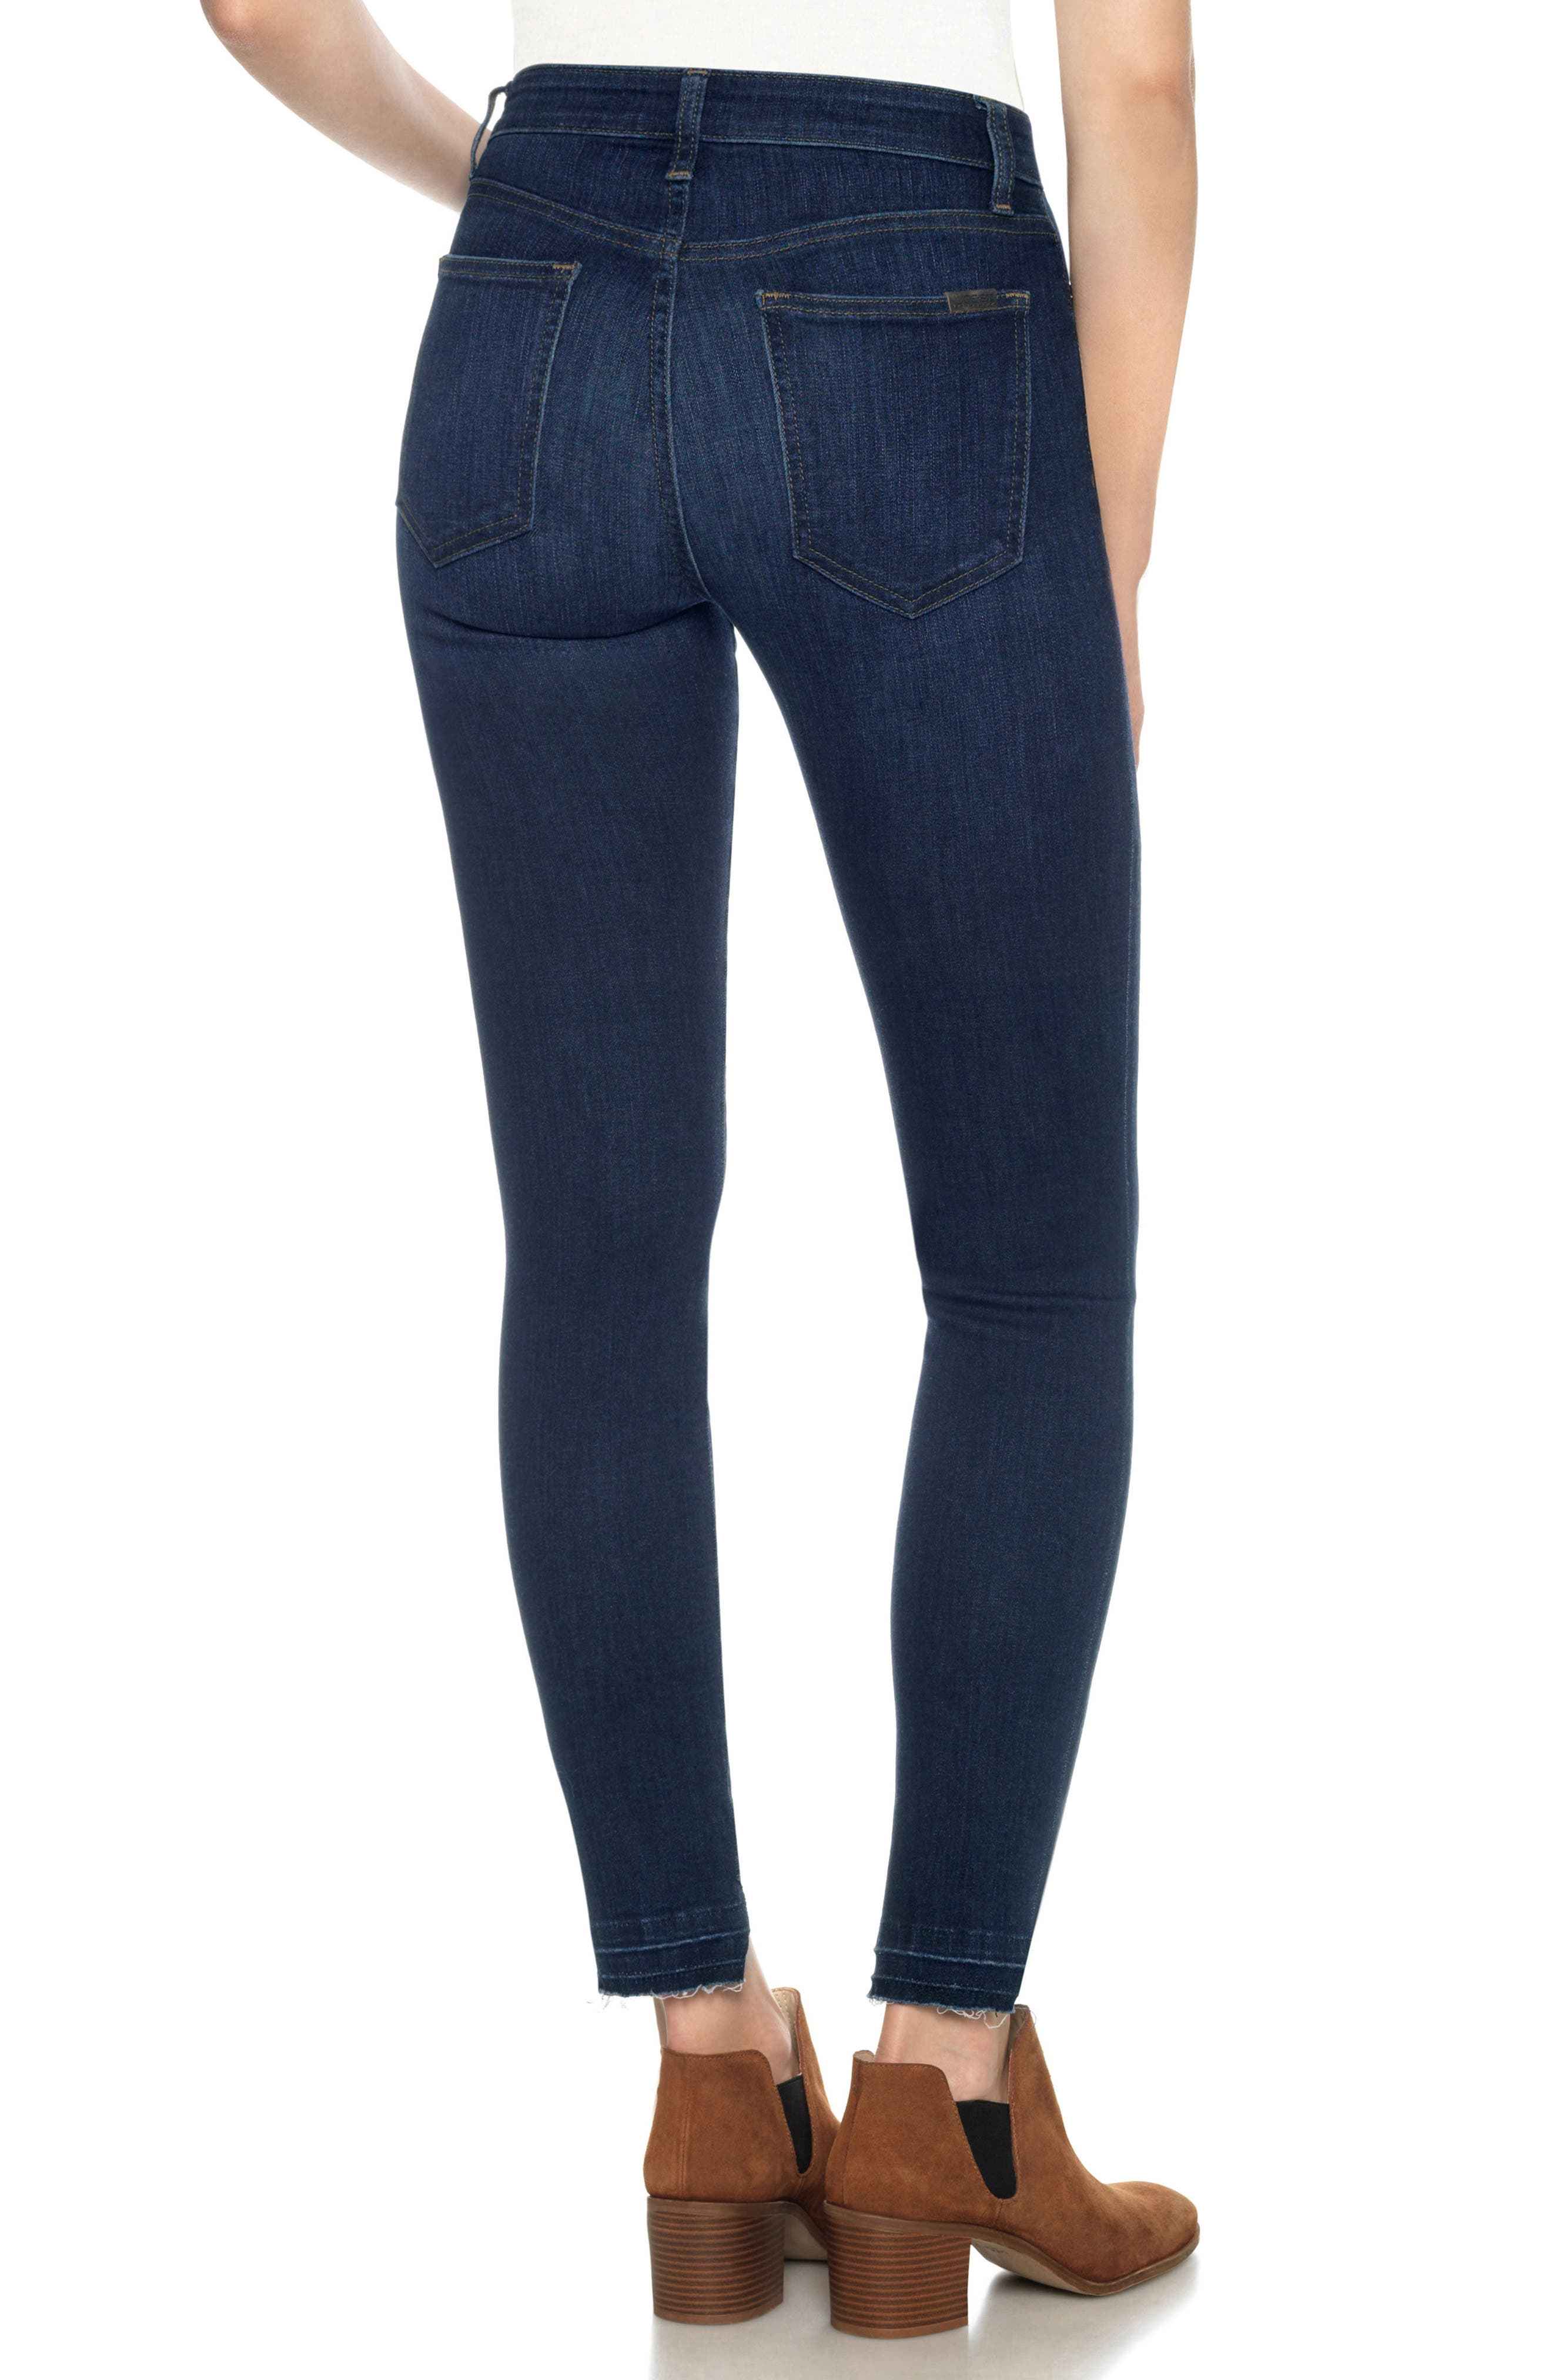 Alternate Image 2  - Joe's Flawless - Charlie High Waist Step Hem Ankle Skinny Jeans (Nurie)